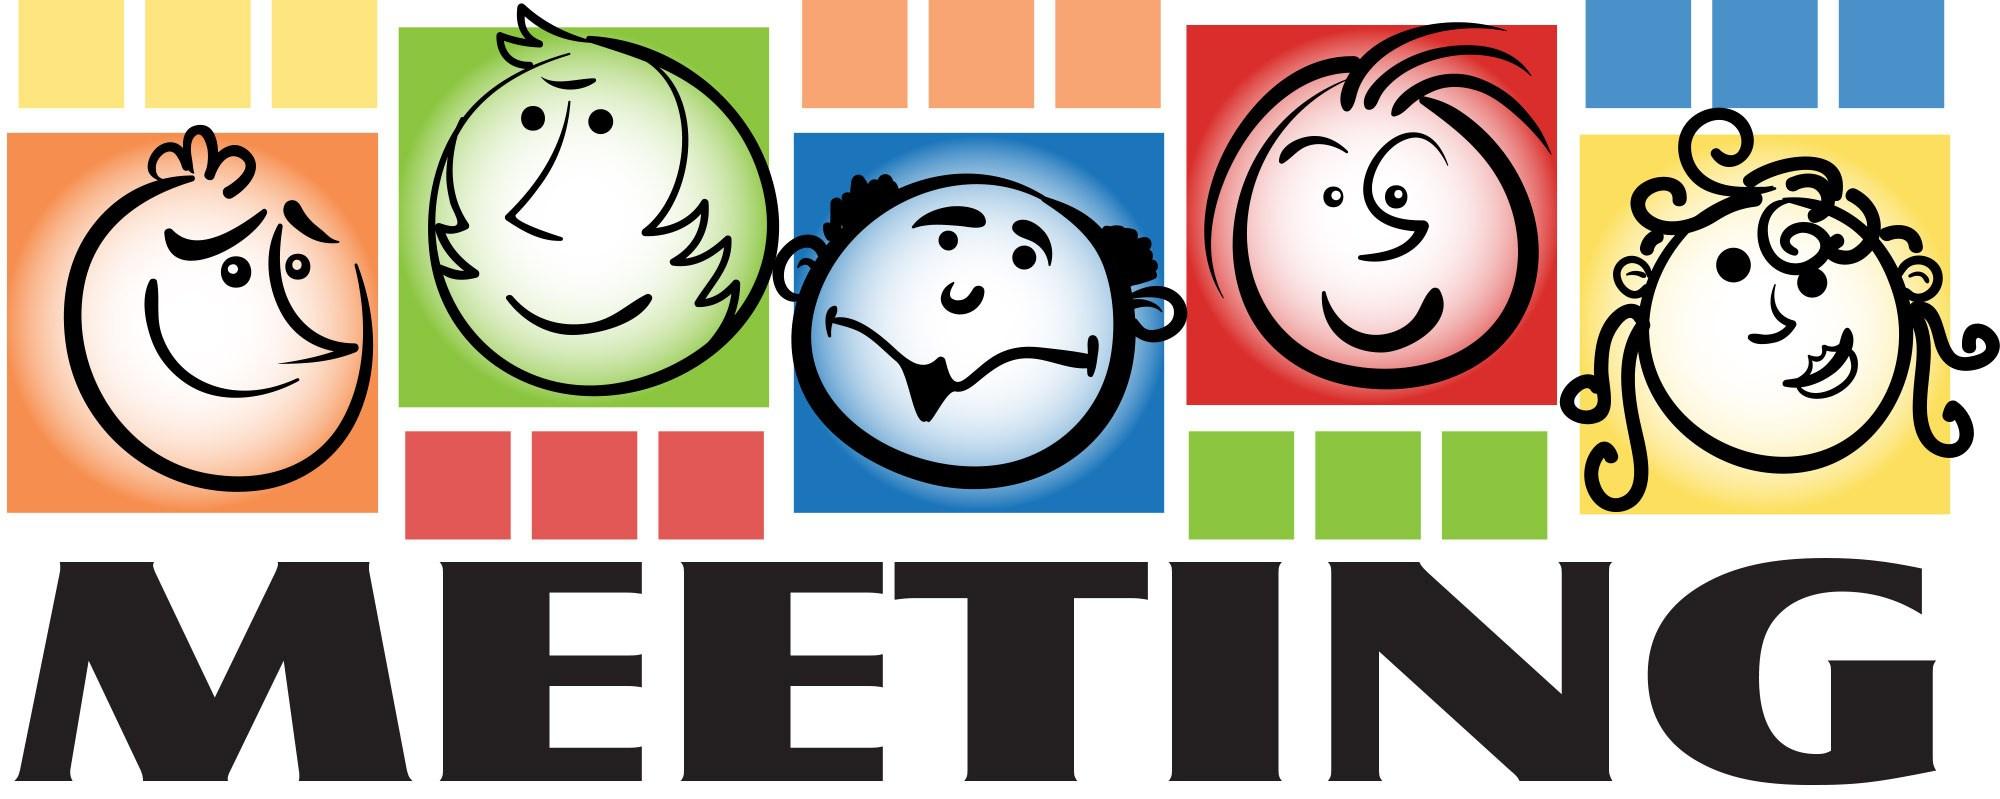 Meeting clipart fun meeting Leadership meeting Meeting Free Council